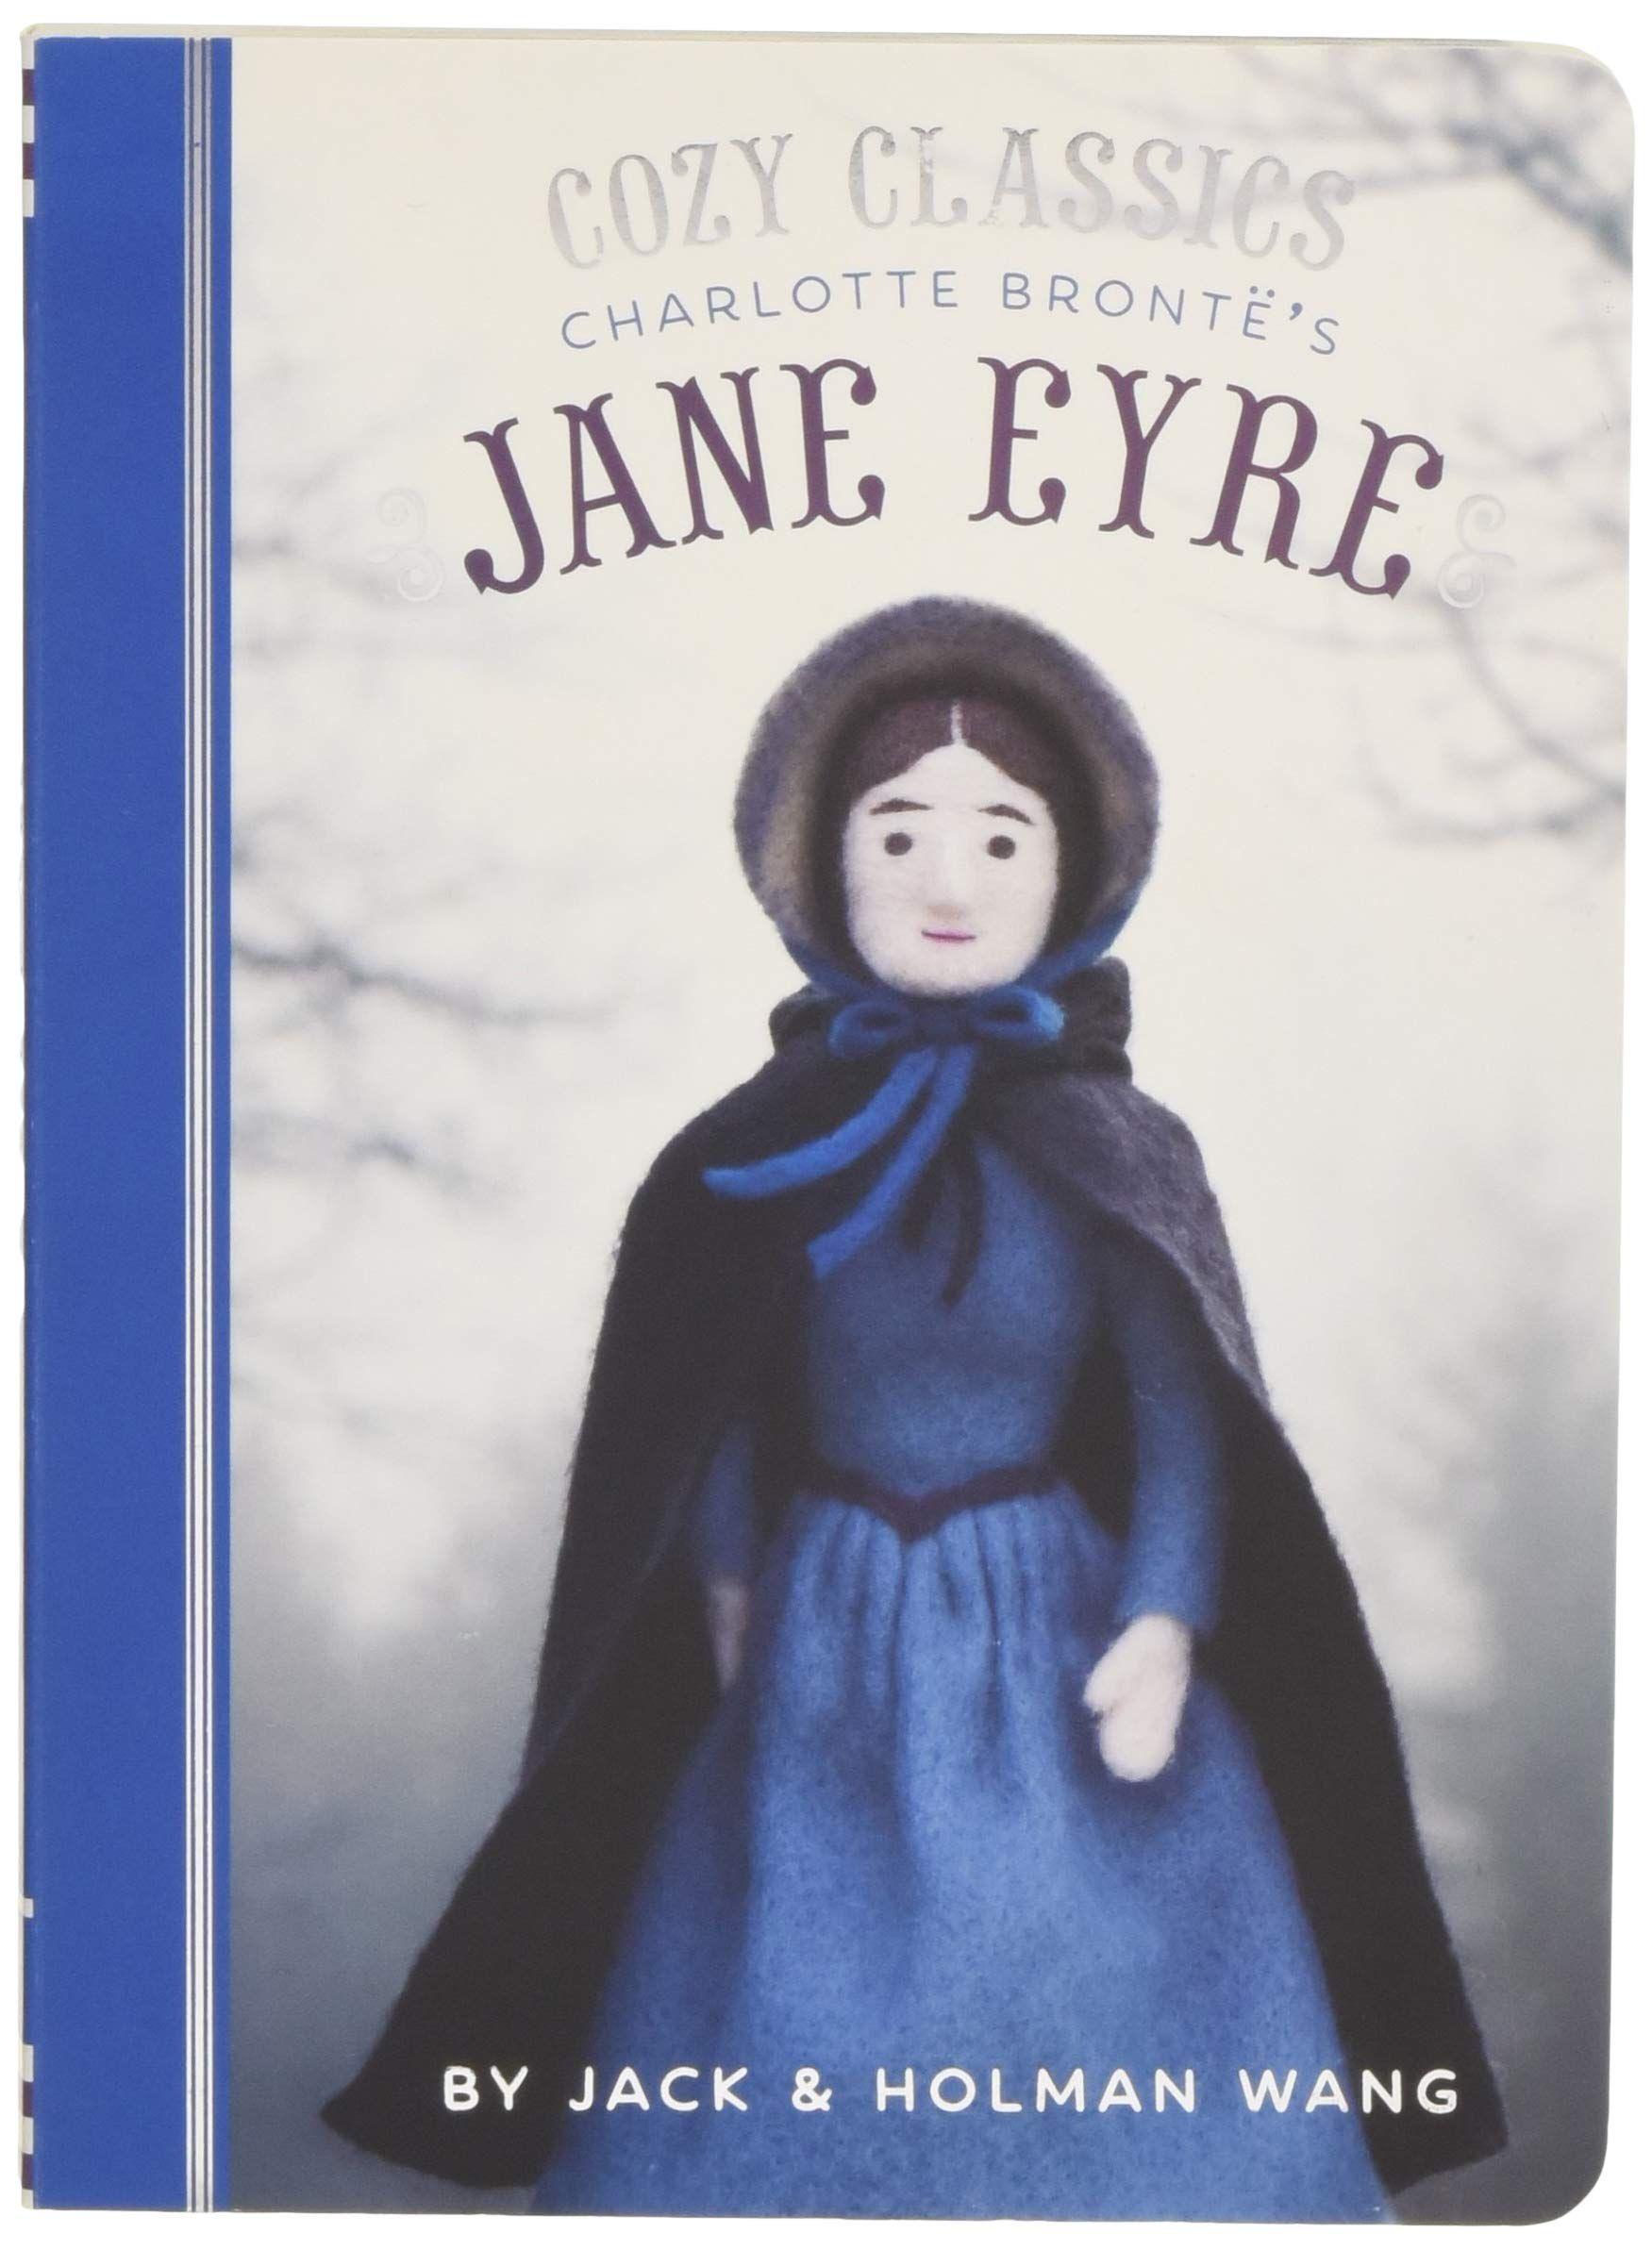 Jane Eyre Cozy Classics cover image